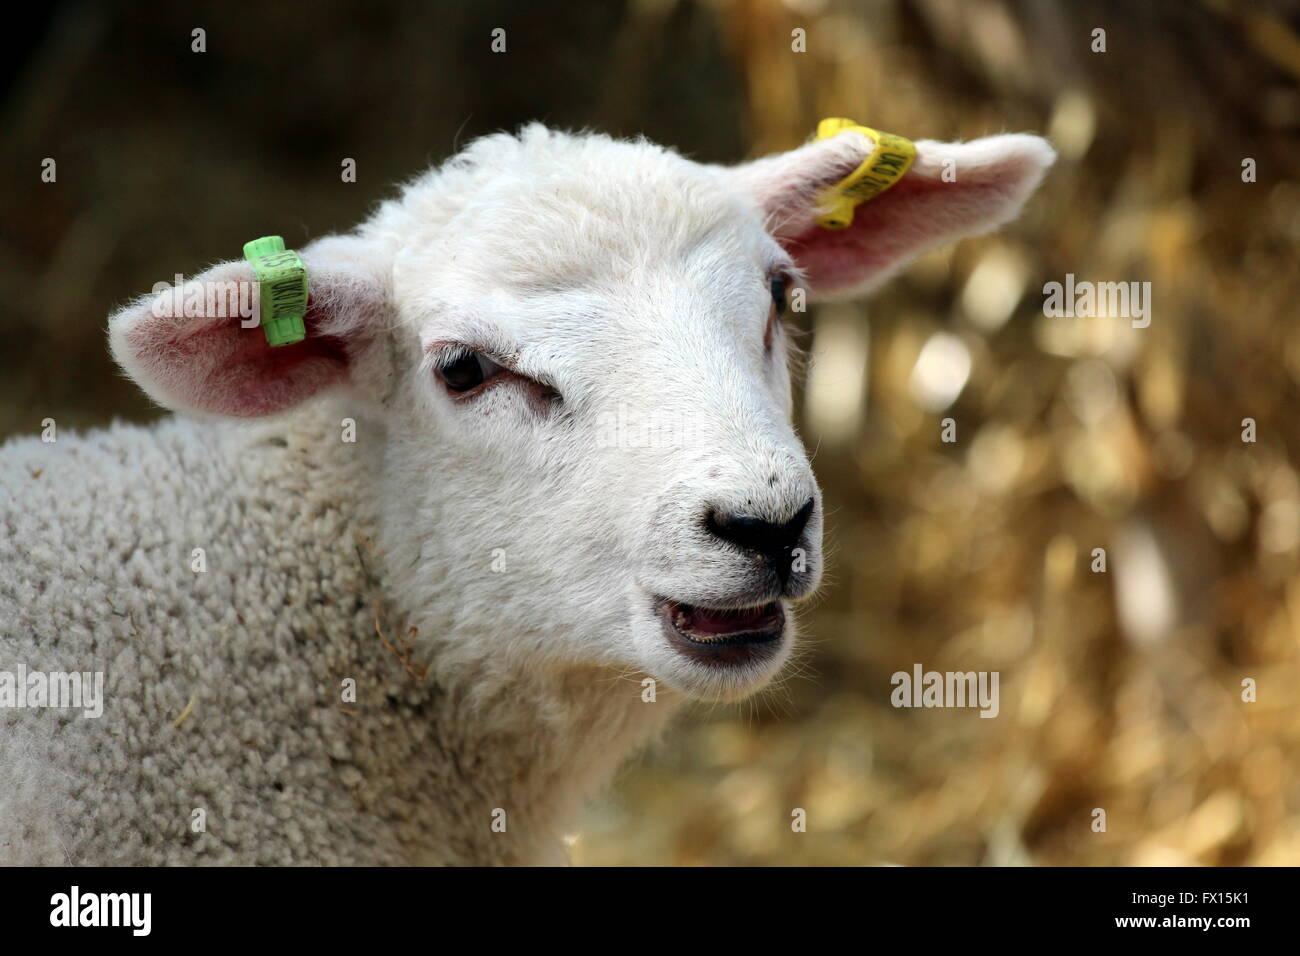 A farm lamb. - Stock Image